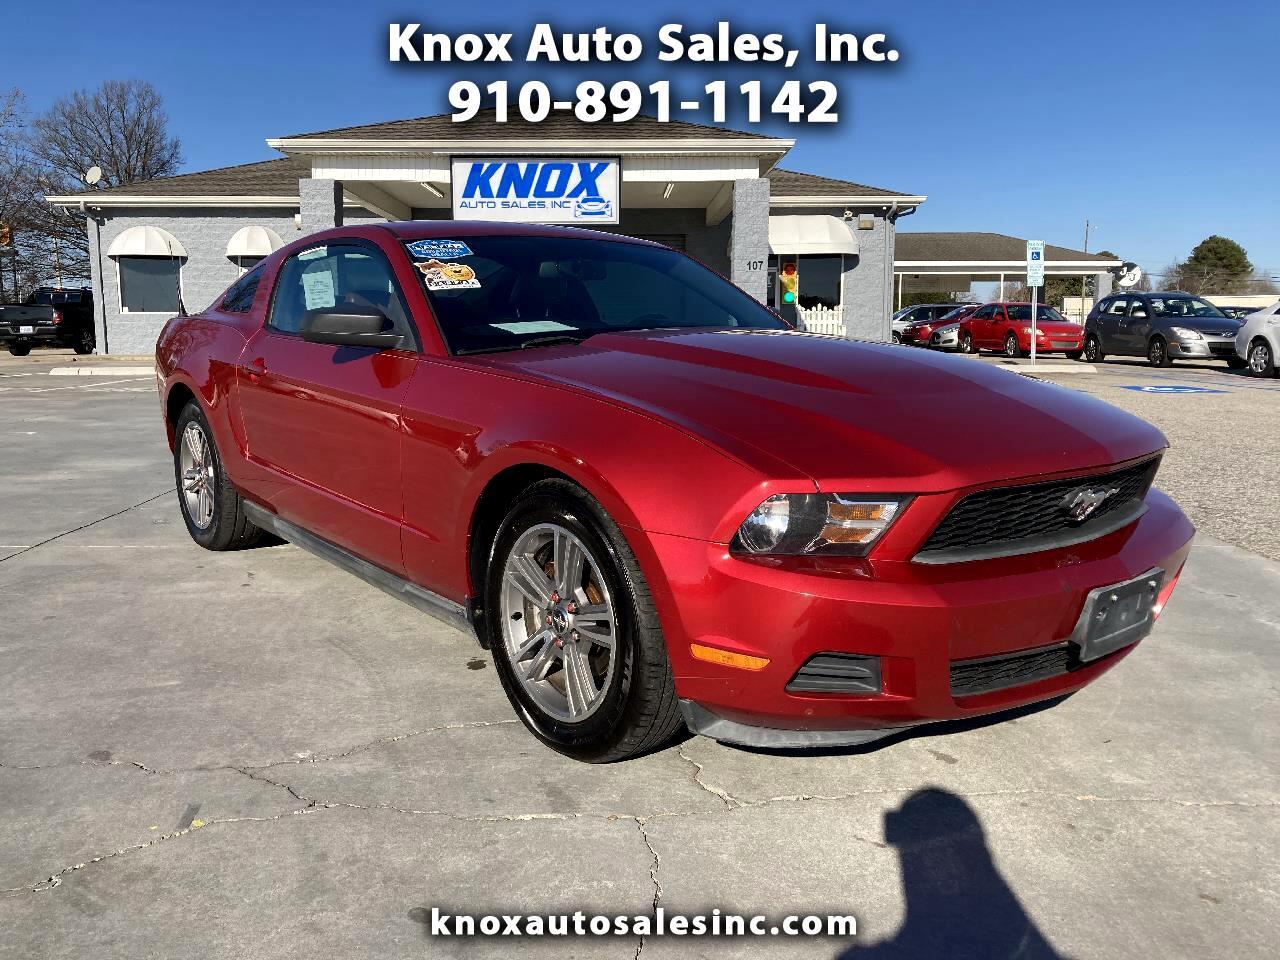 Ford Mustang 2dr Cpe V6 Premium 2010